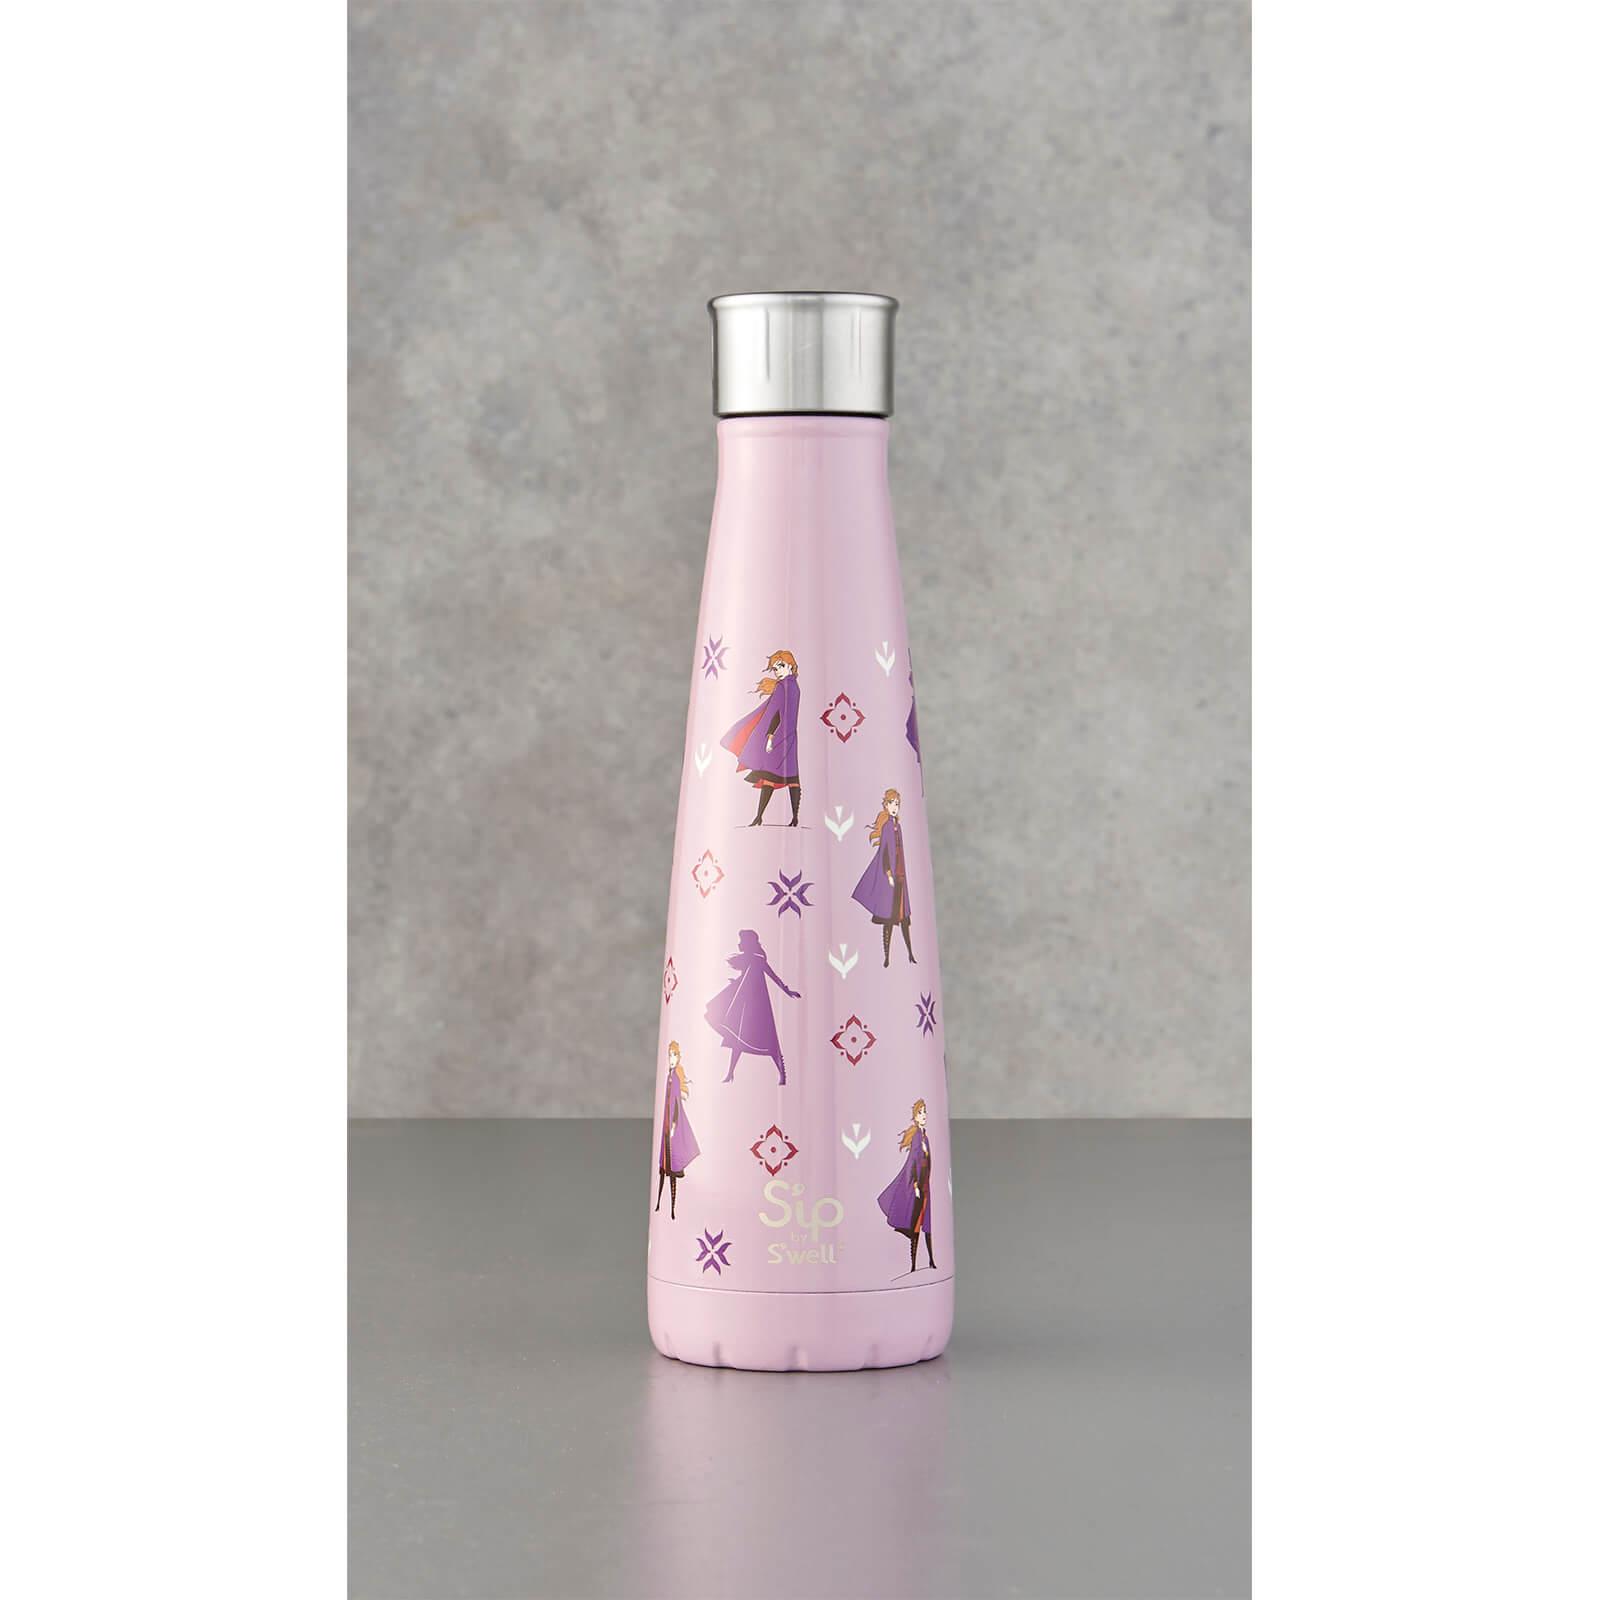 S'ip By S'well Disney Frozen Brave Princess Anna Water Bottle 450Ml